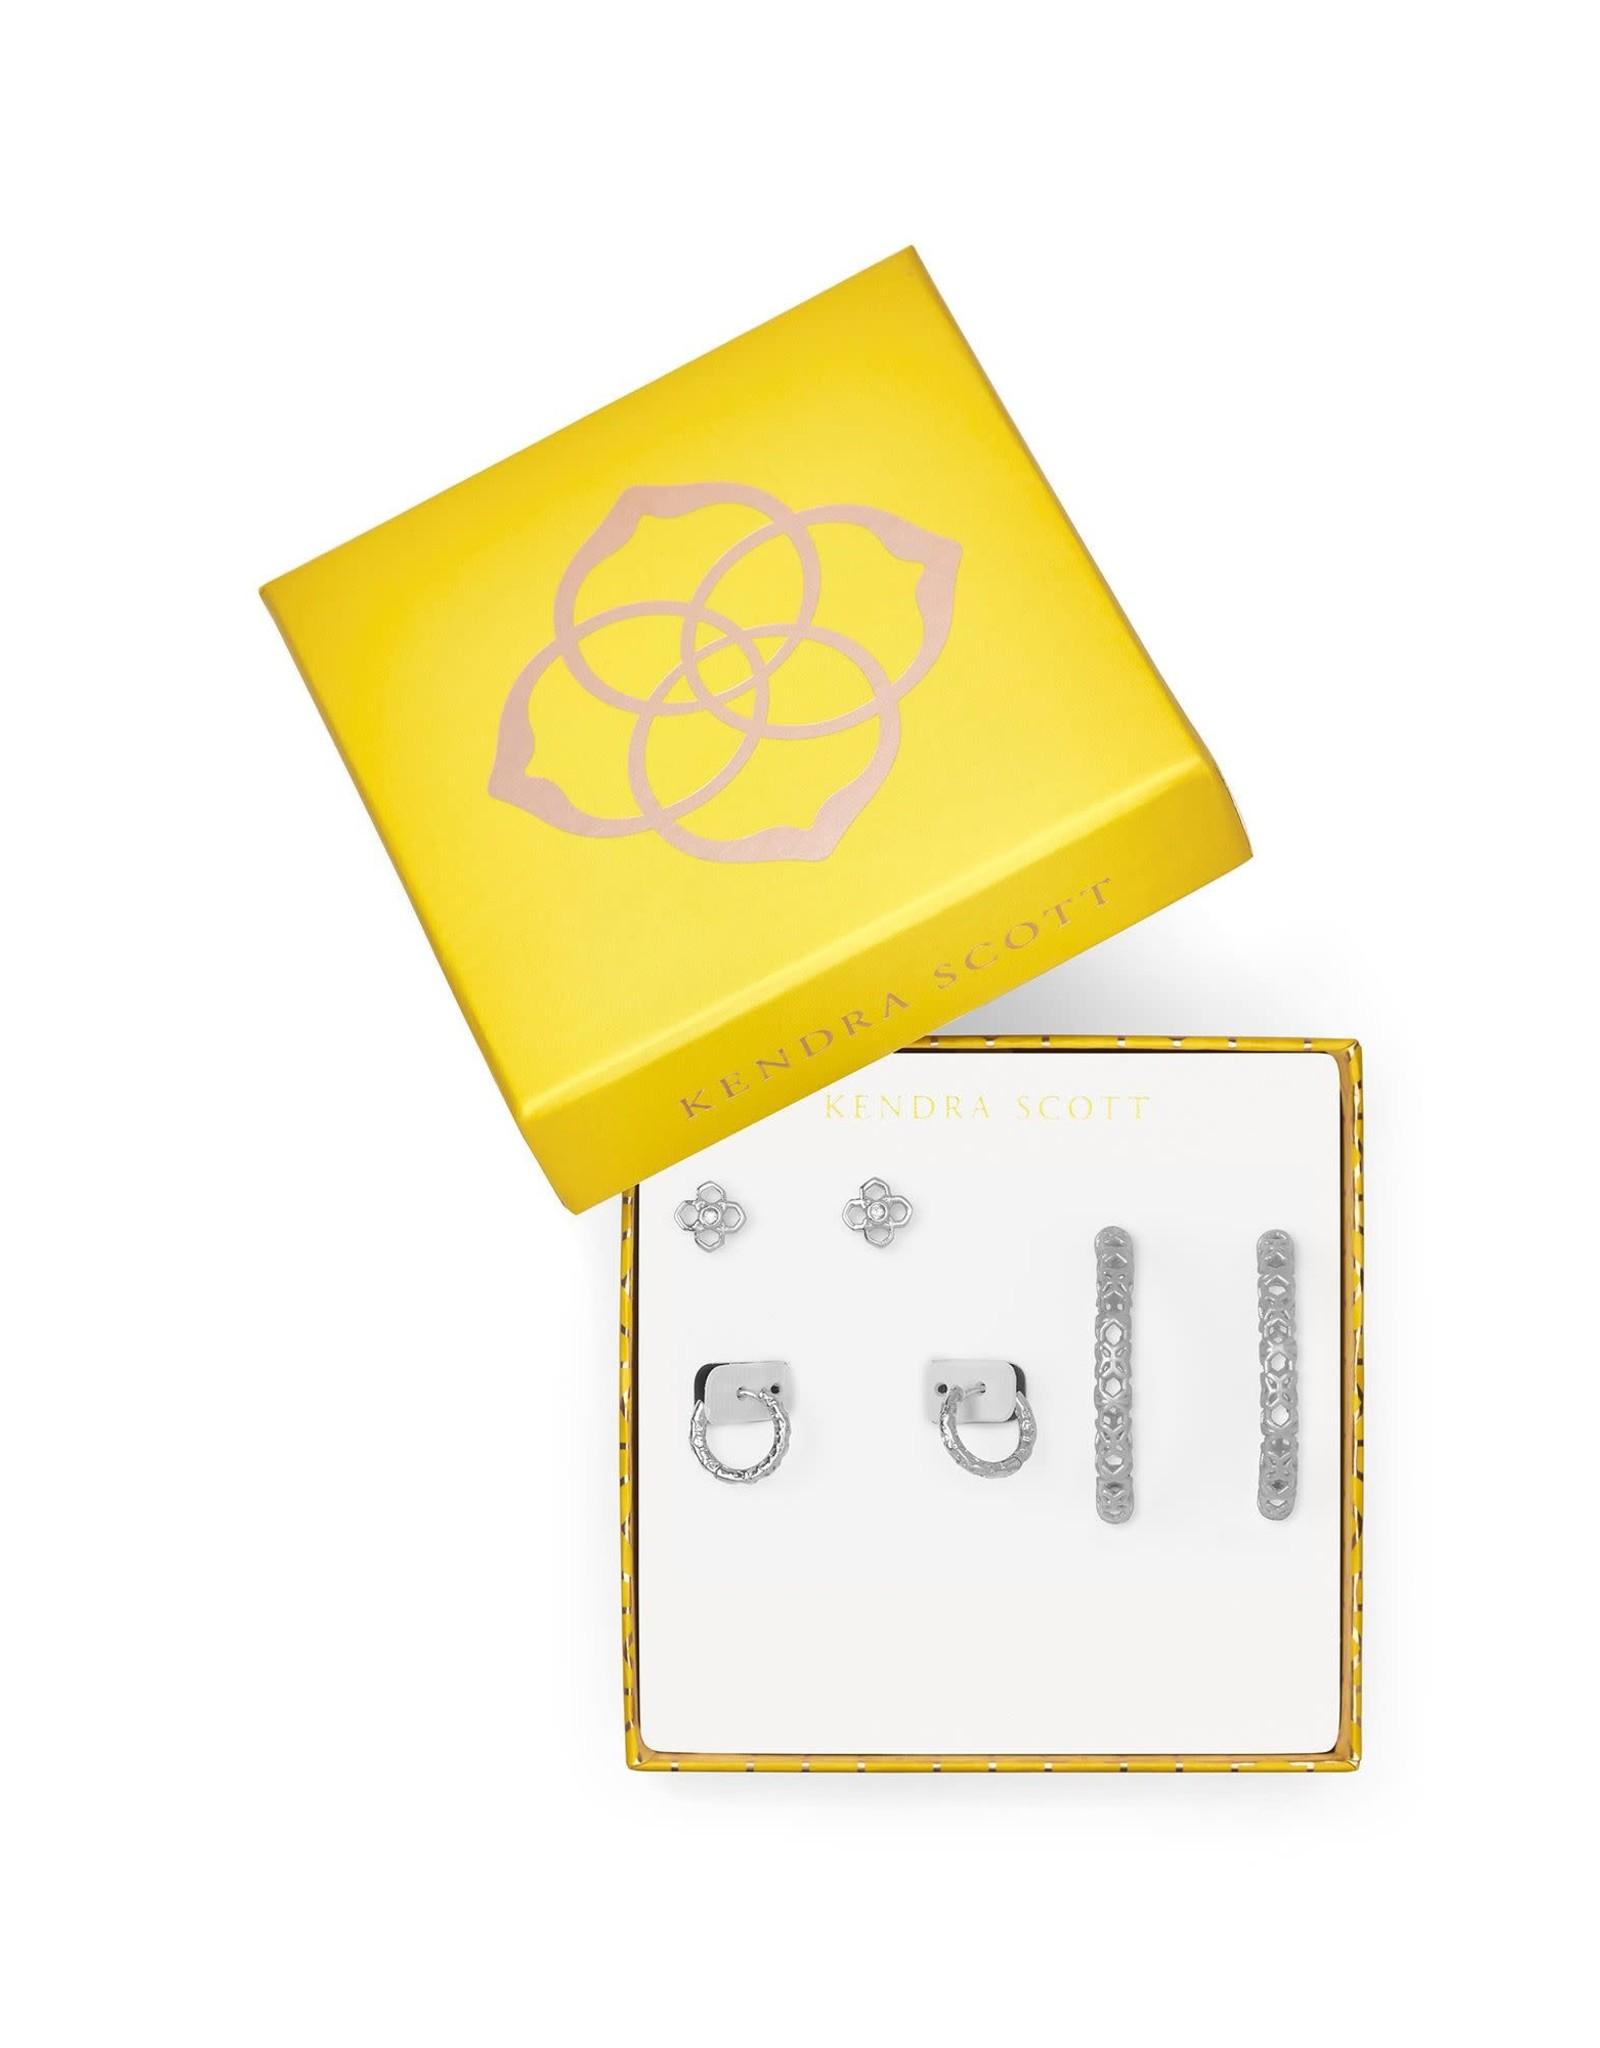 Kendra Scott 4217717869 - Maggie 3pc Earring Set - Rhodium